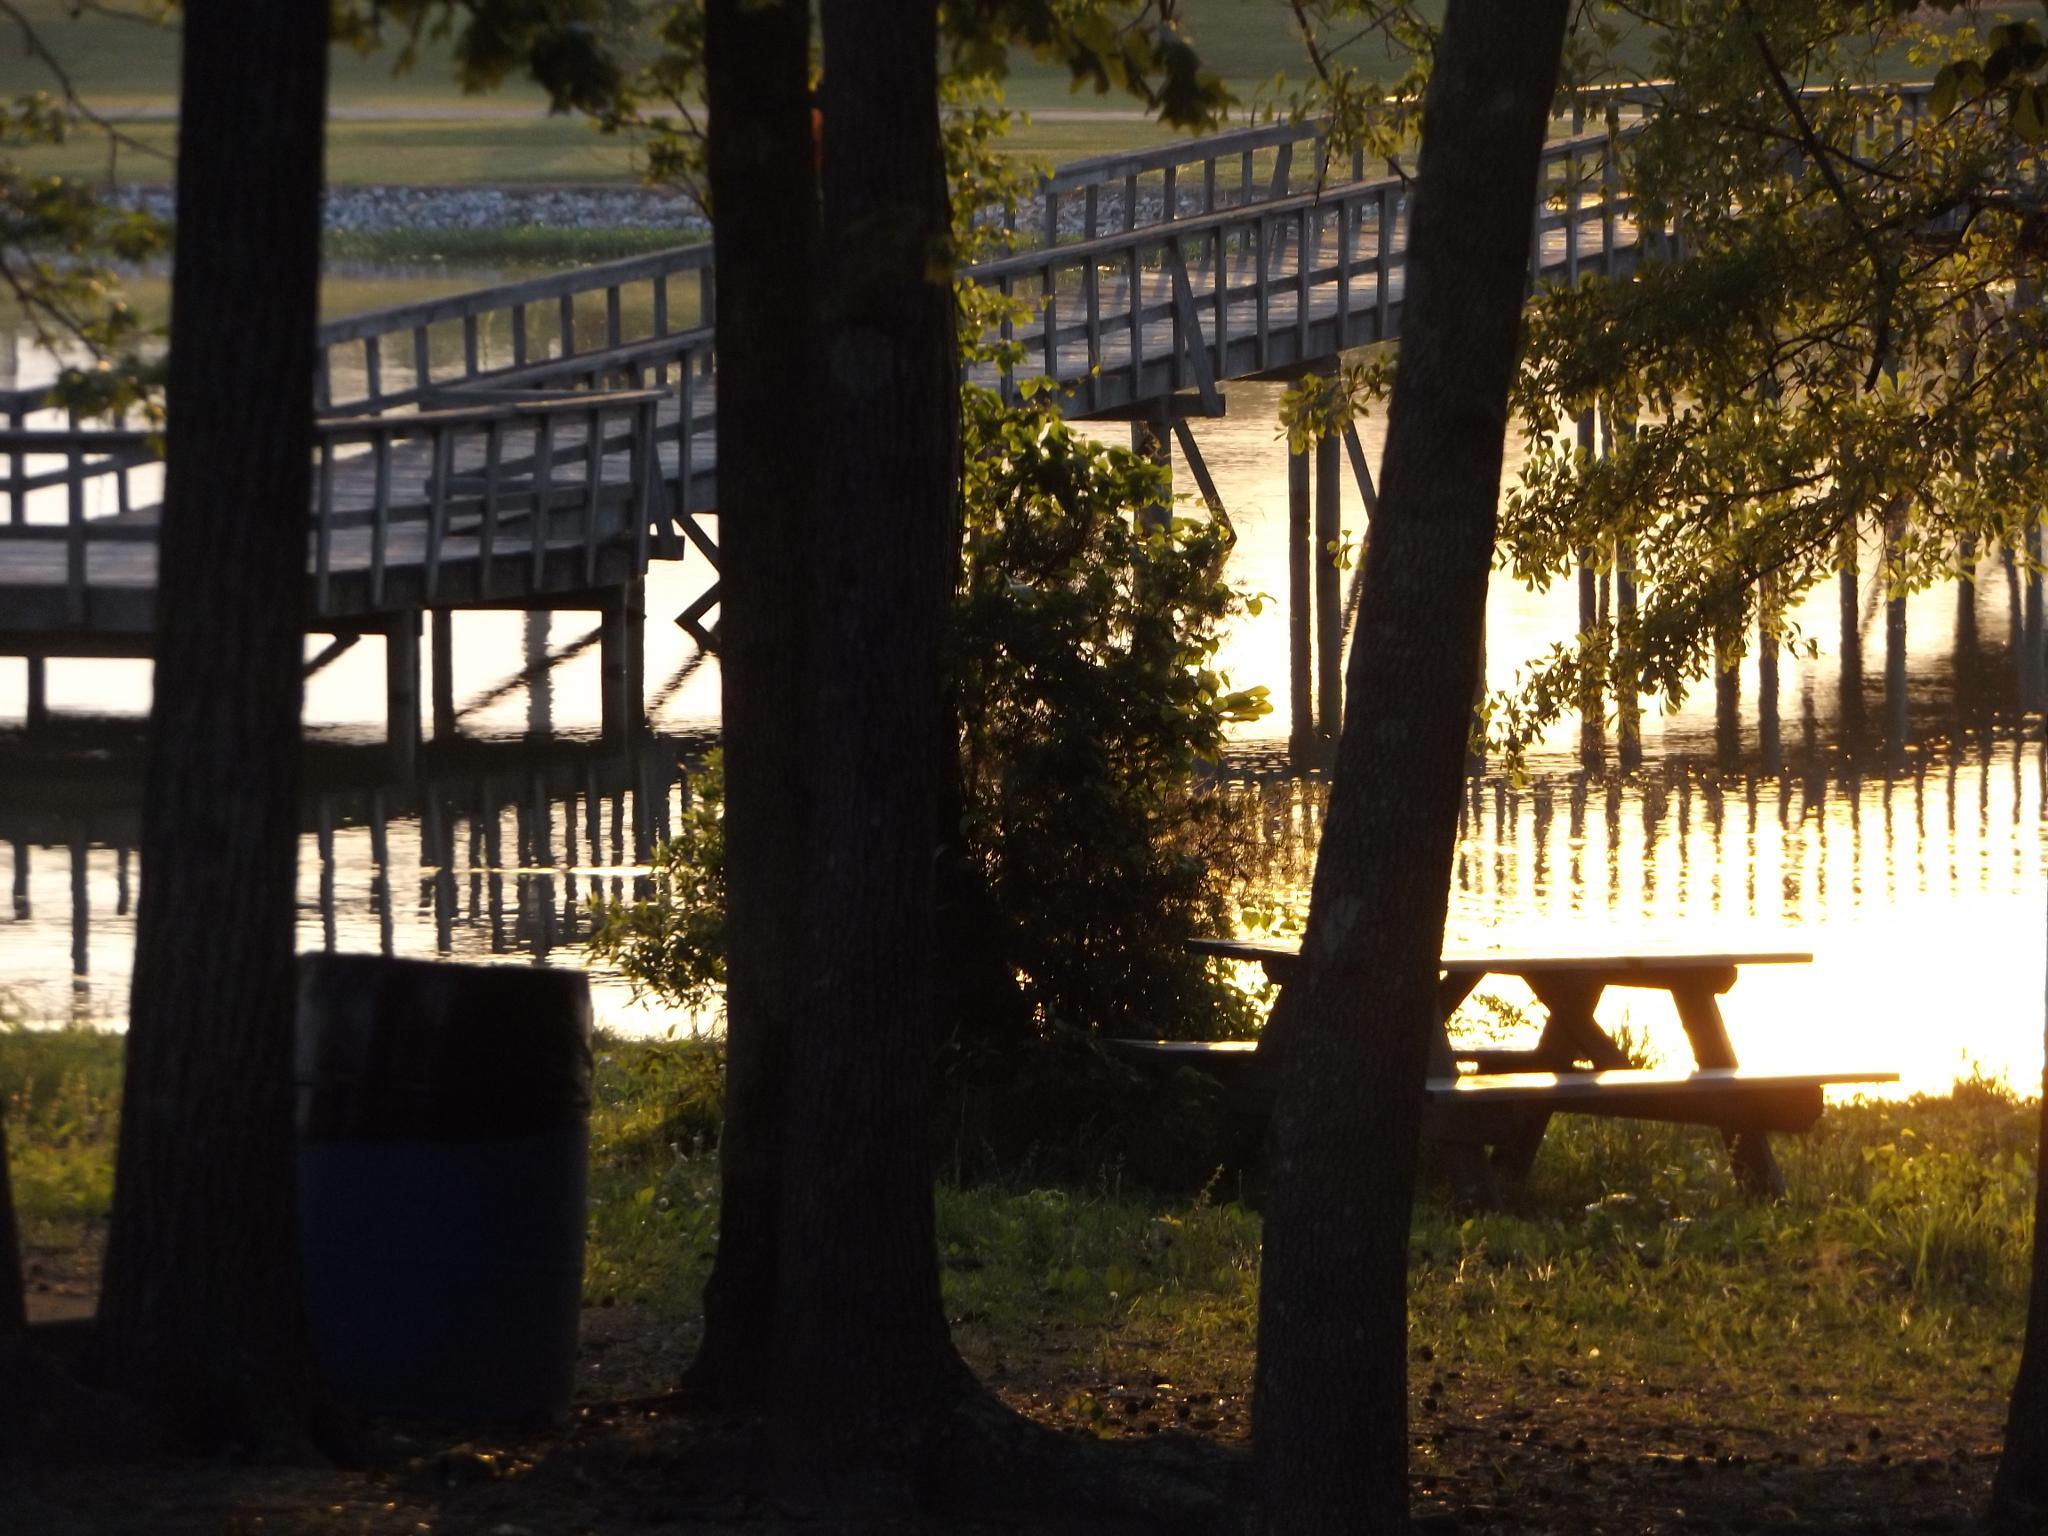 Park in Pell City, Alabama by lisarobertsbell